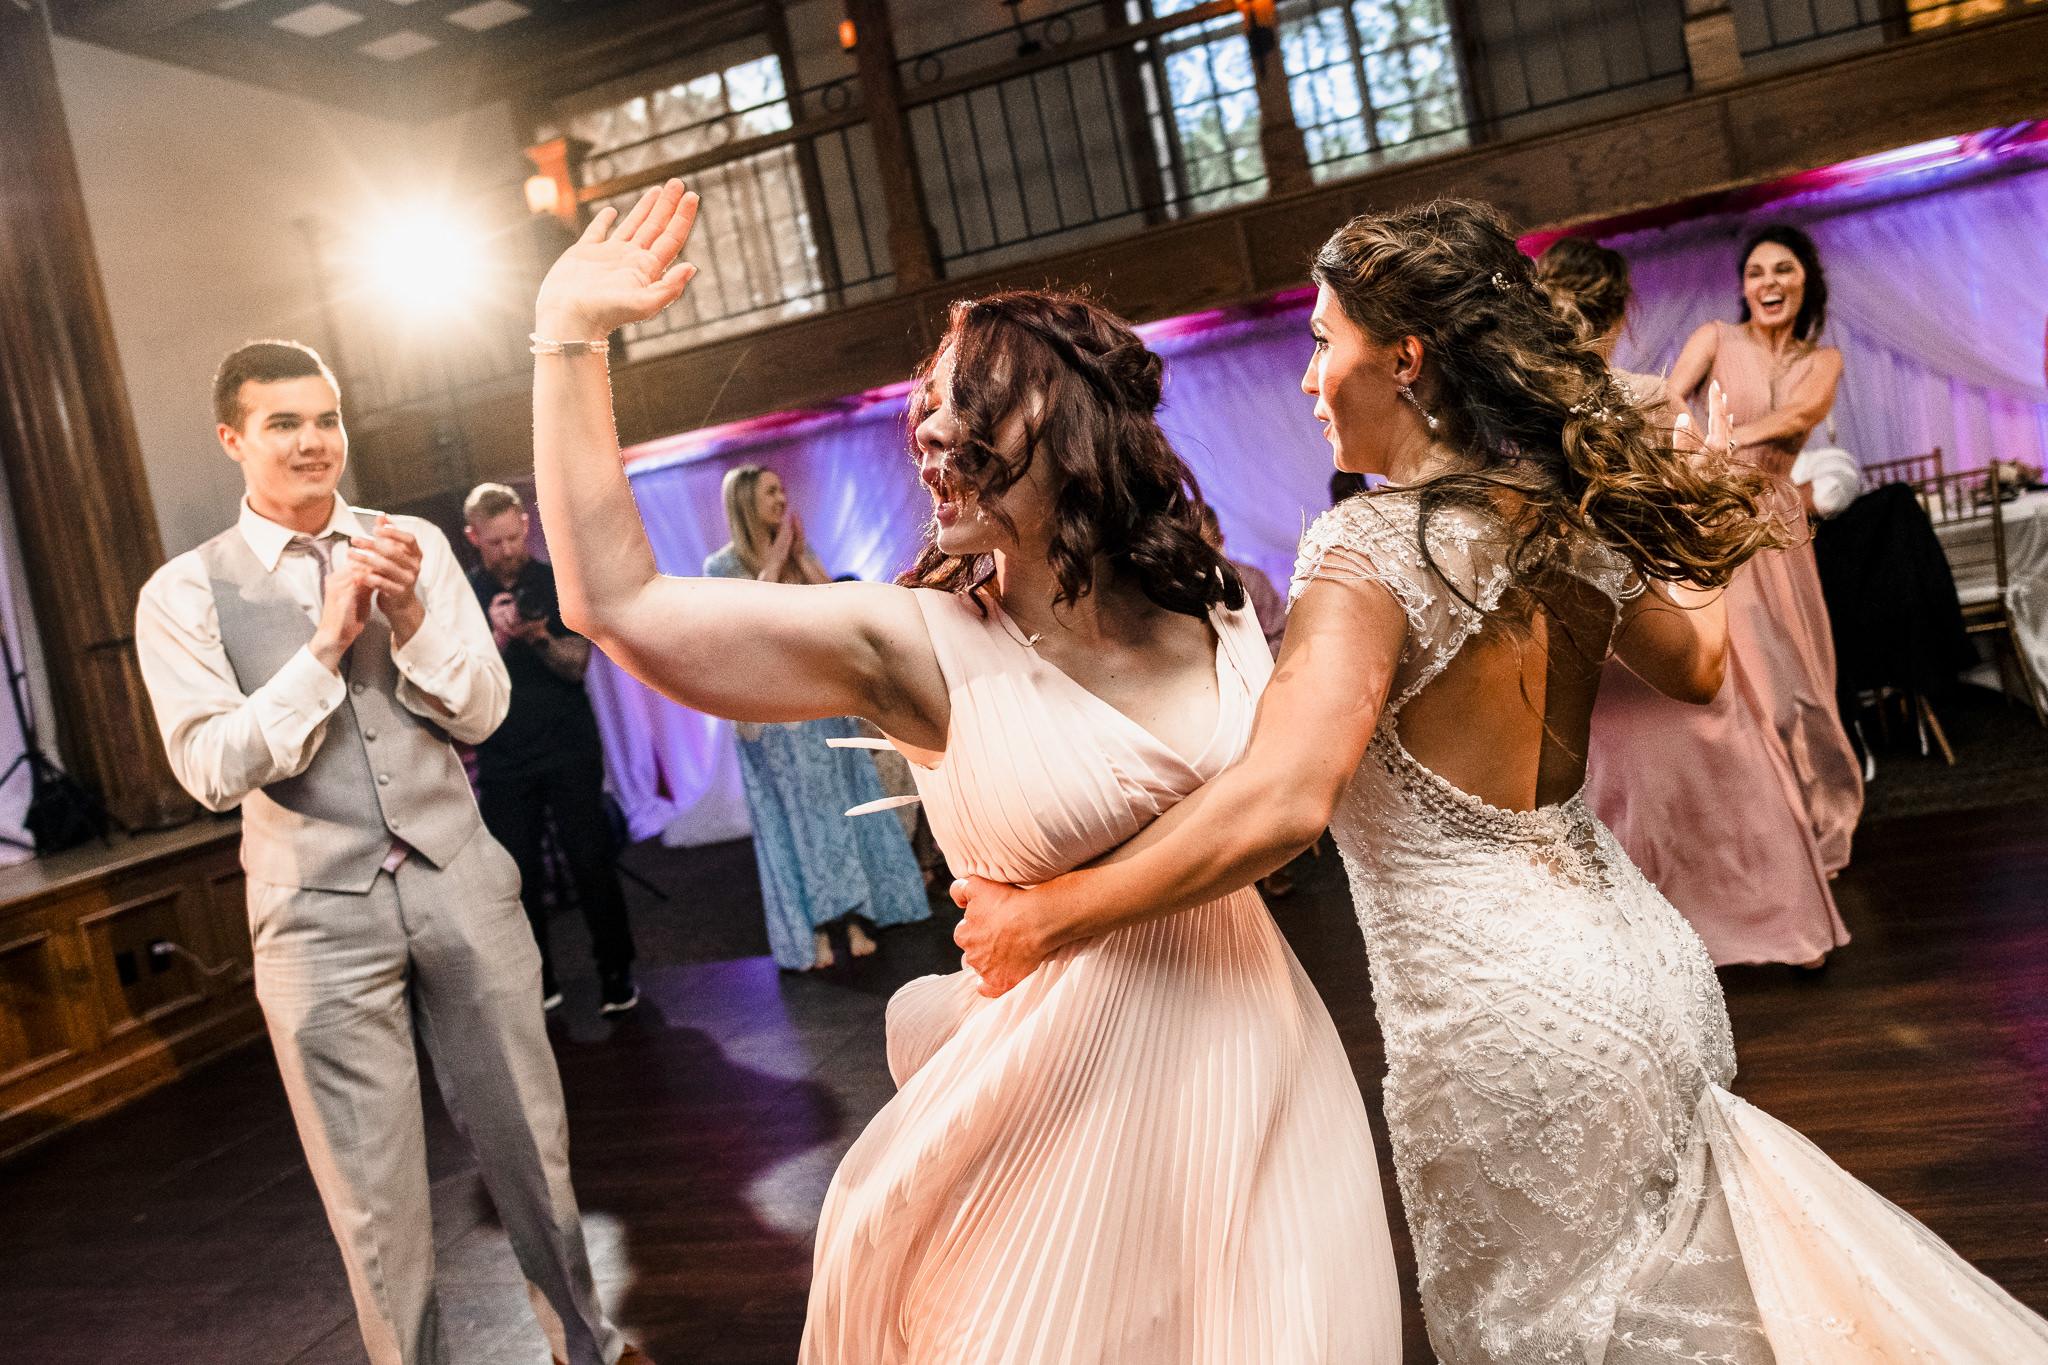 Barbato-Moorestown-Community-House-Wedding-New-Jersey-Photographer-40.JPG